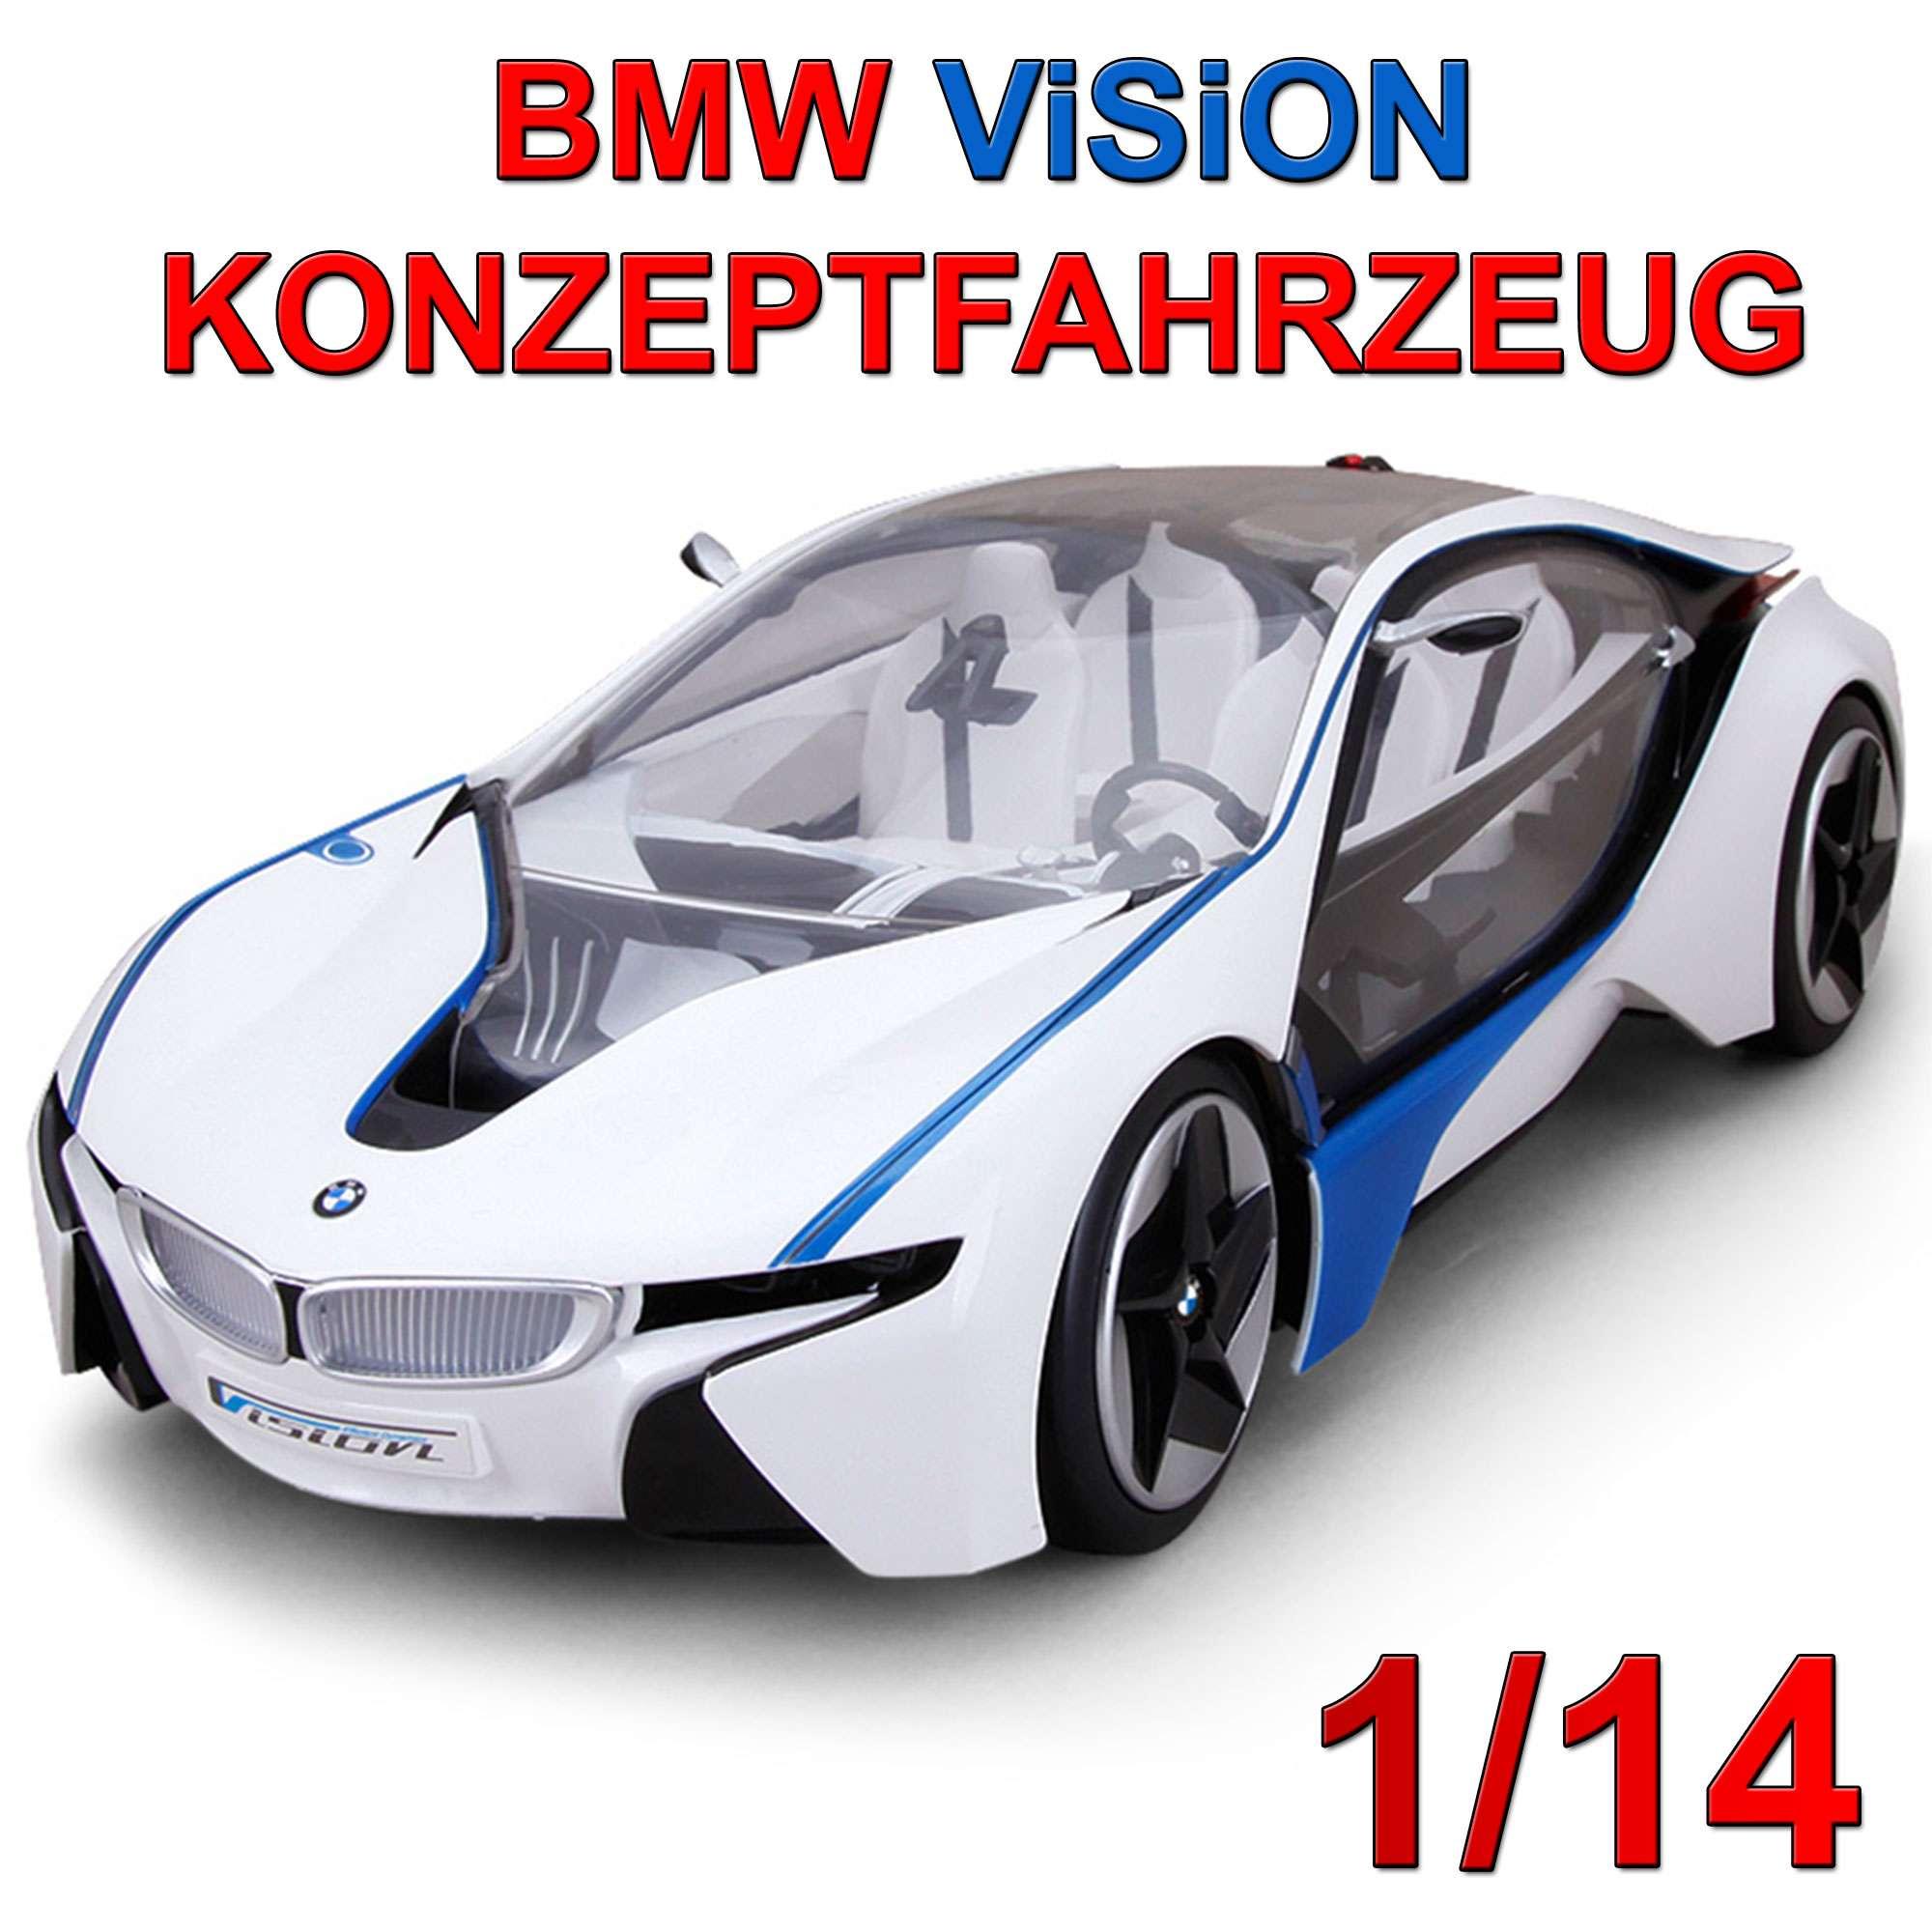 original bmw vision concept car rc ferngesteuertes auto. Black Bedroom Furniture Sets. Home Design Ideas